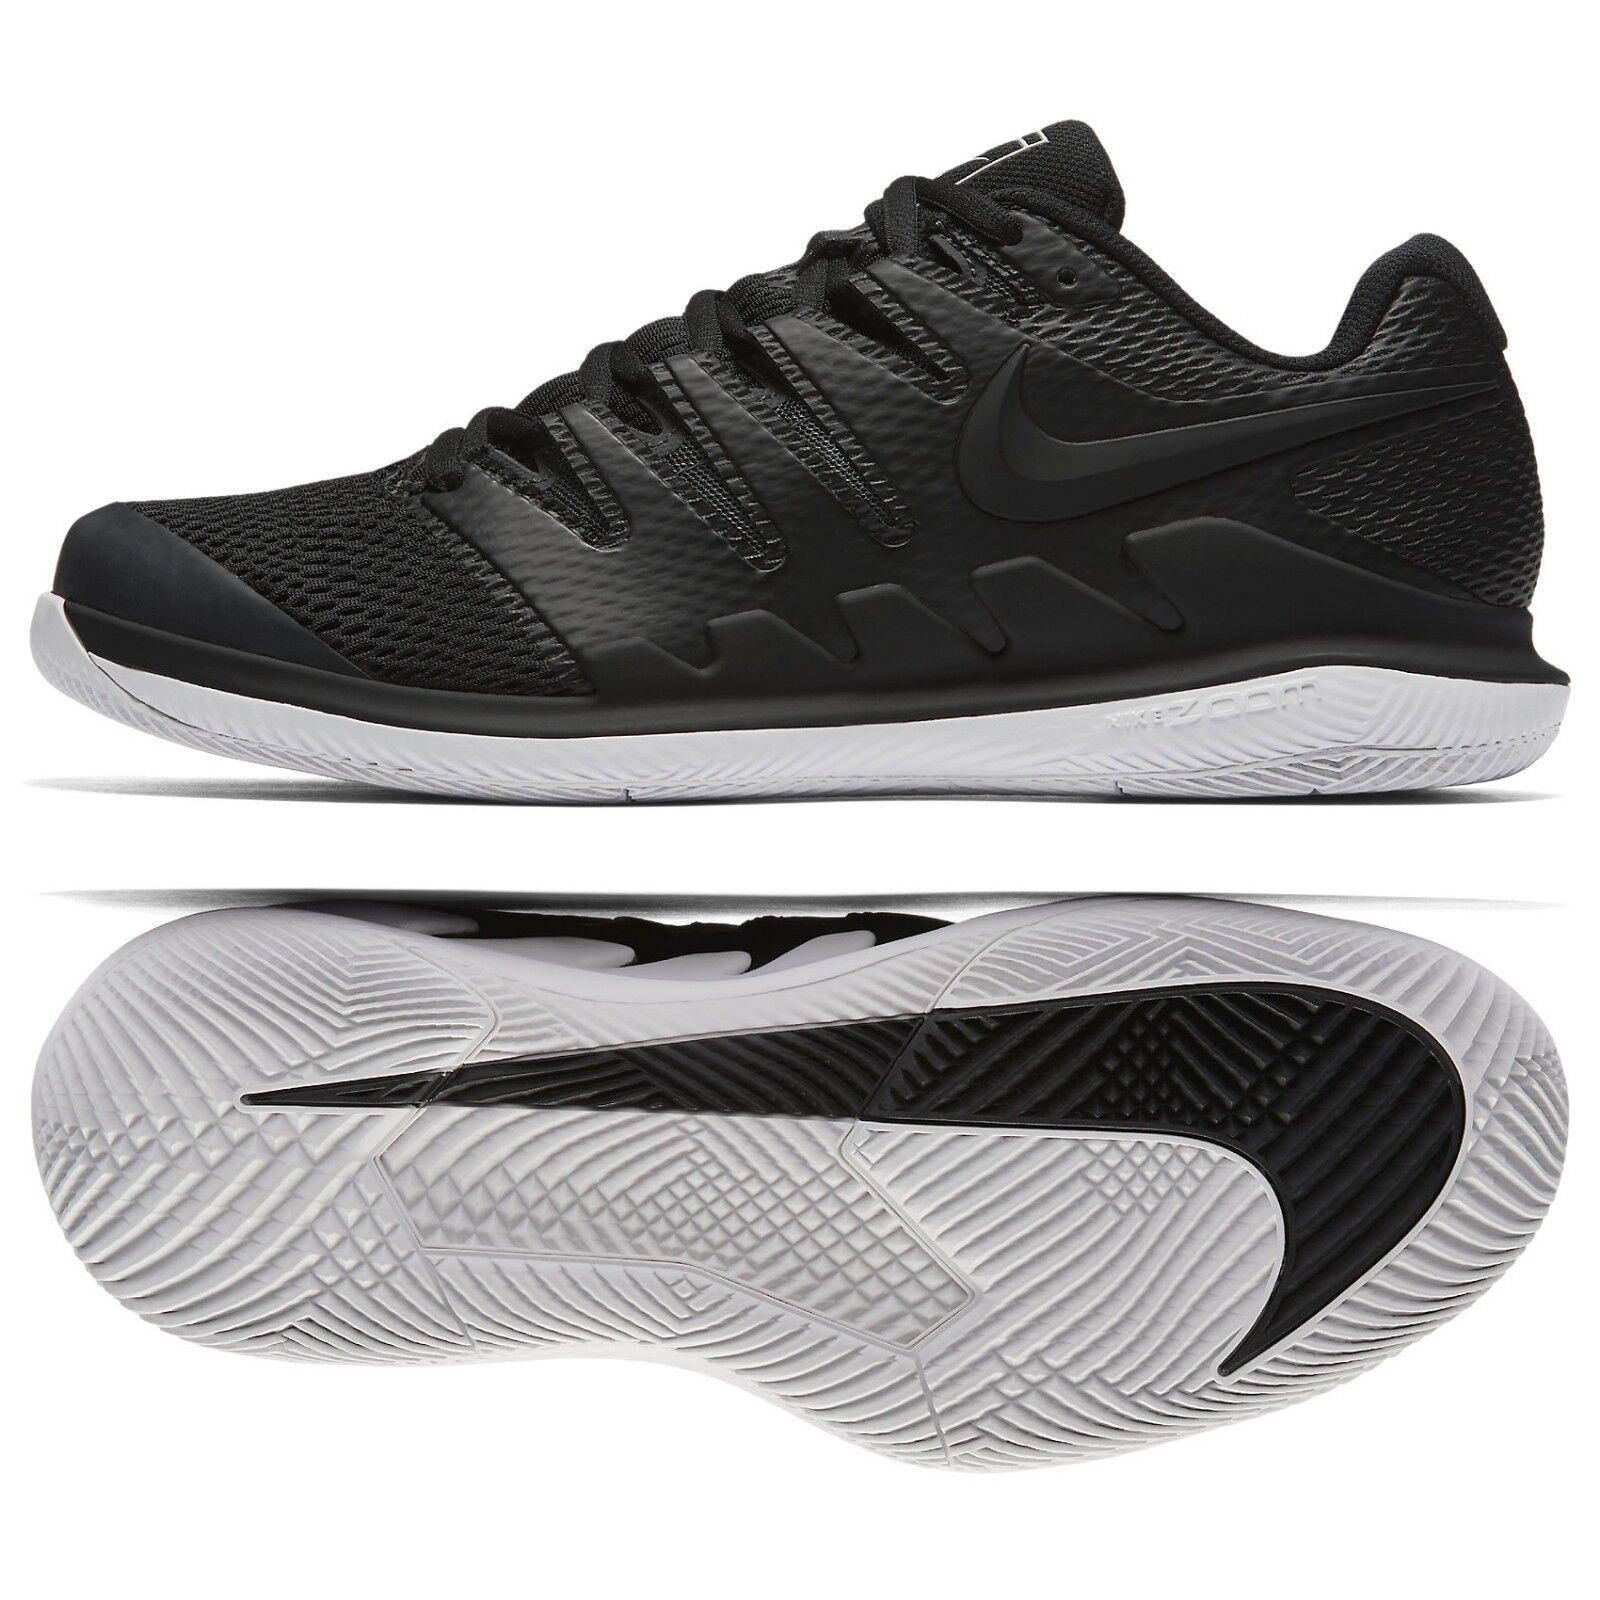 Nike Air Zoom Vapor X HC AA8030-010 nero Vast grigio grigio grigio Men's Tennis scarpe Sz 8.5 913315